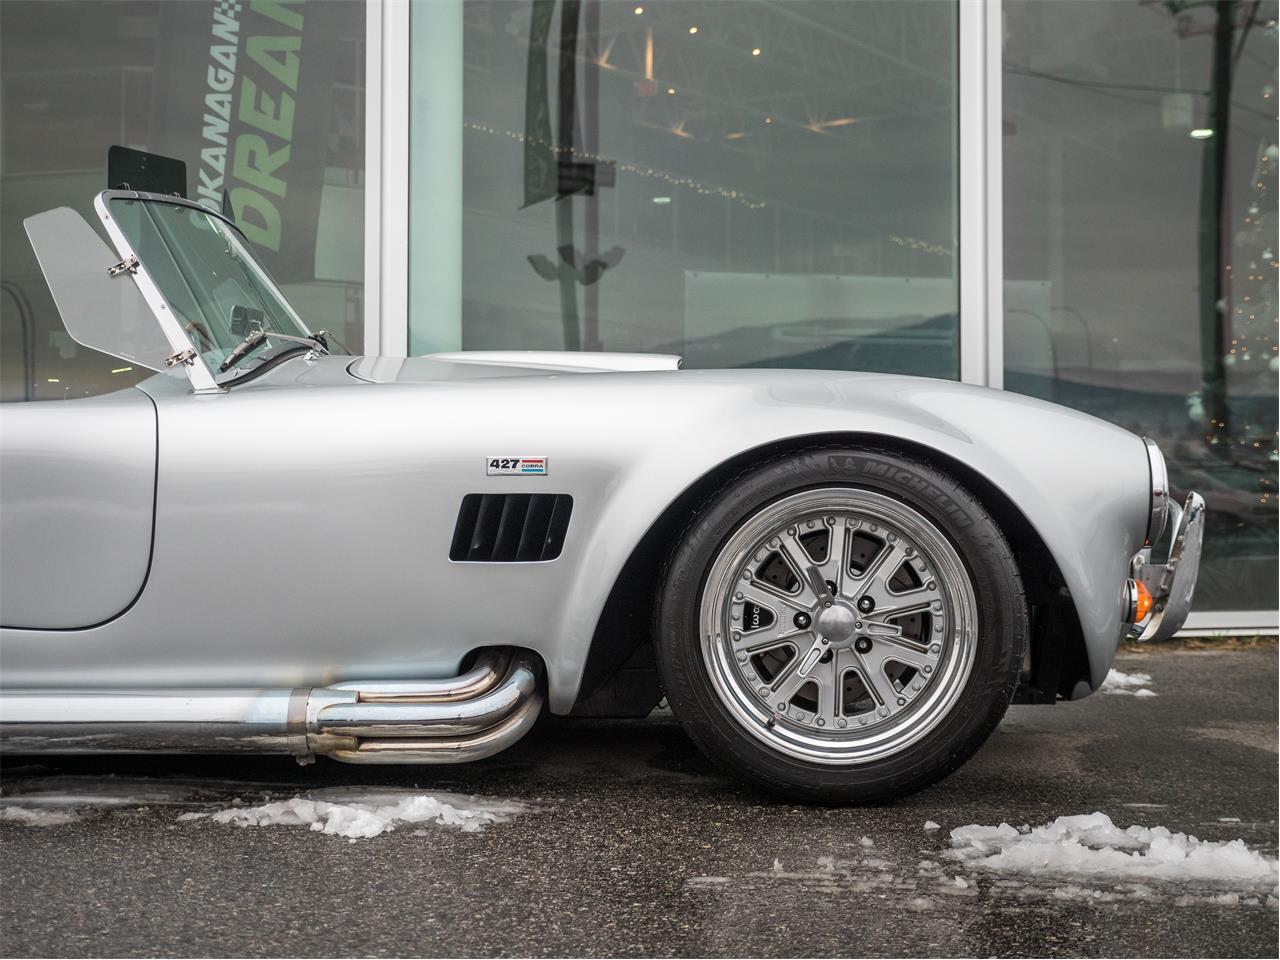 Large Picture of 1977 Cobra located in British Columbia - $59,990.00 - PNQT